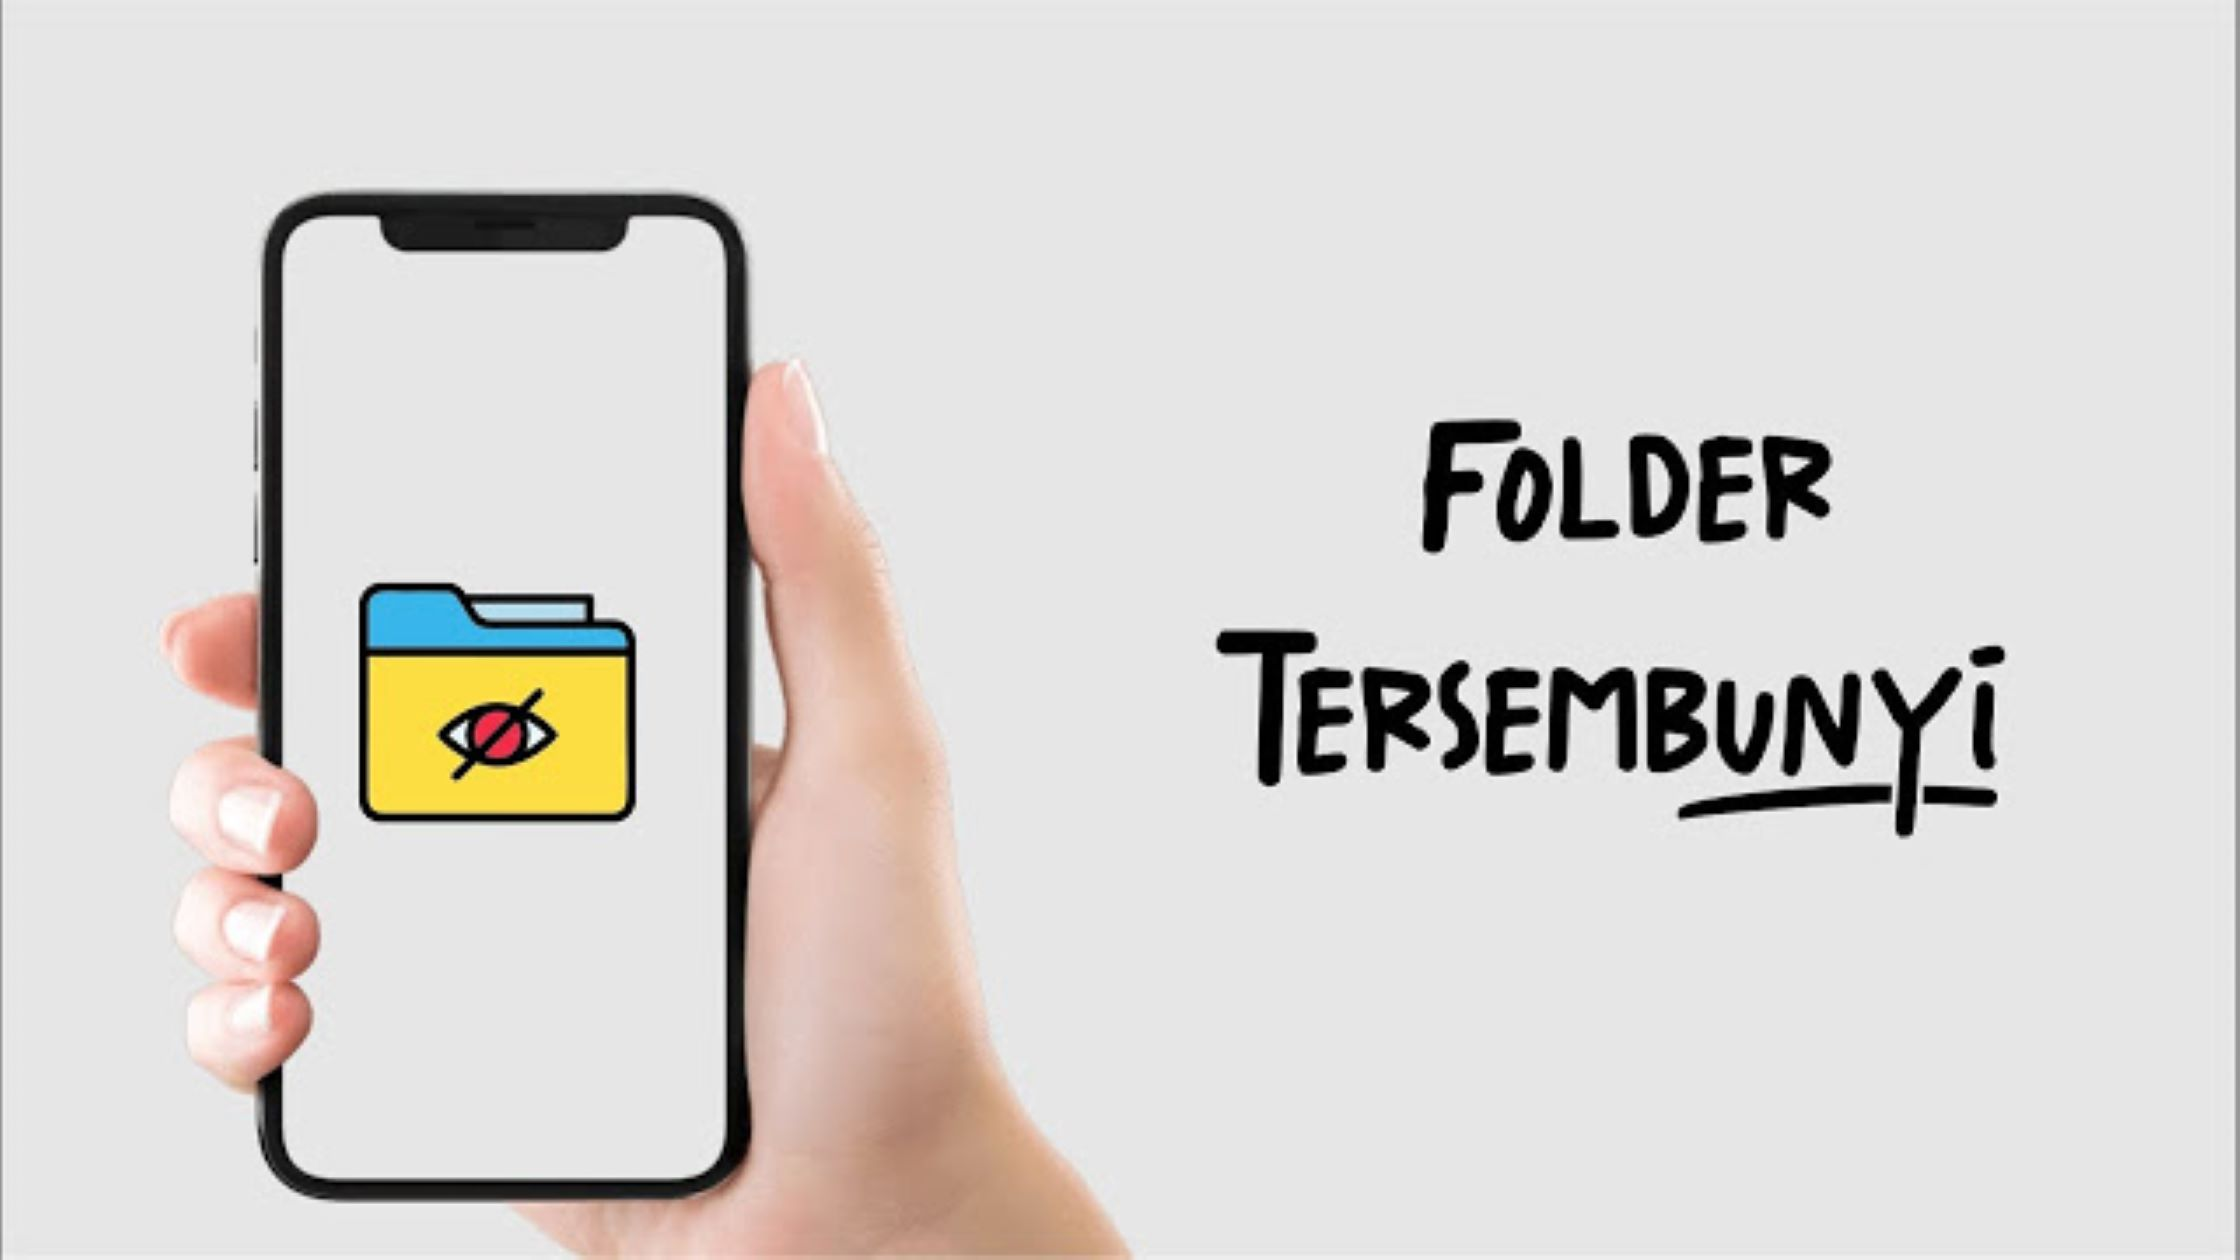 Beginilah Cara Membuat Folder Tersembunyi di Android